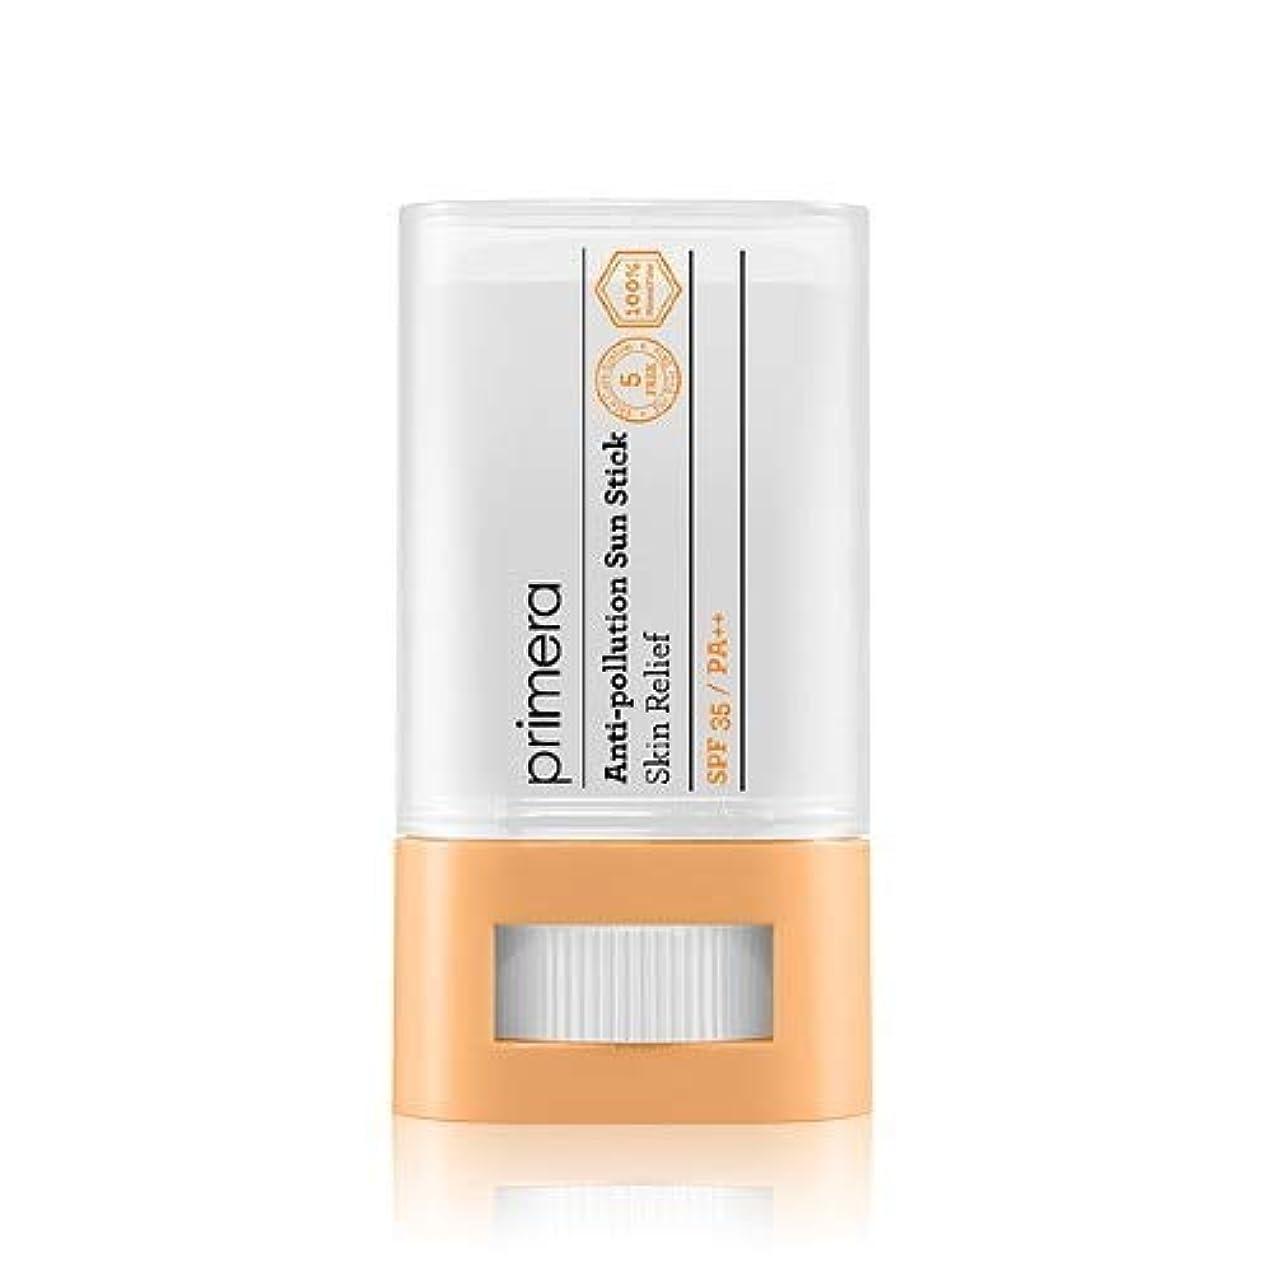 PRIMERA プリメラ Skin Relief Anti-pollution Sun Stick サンスティック 16g, SPF35 PA++ 韓国日焼け止め